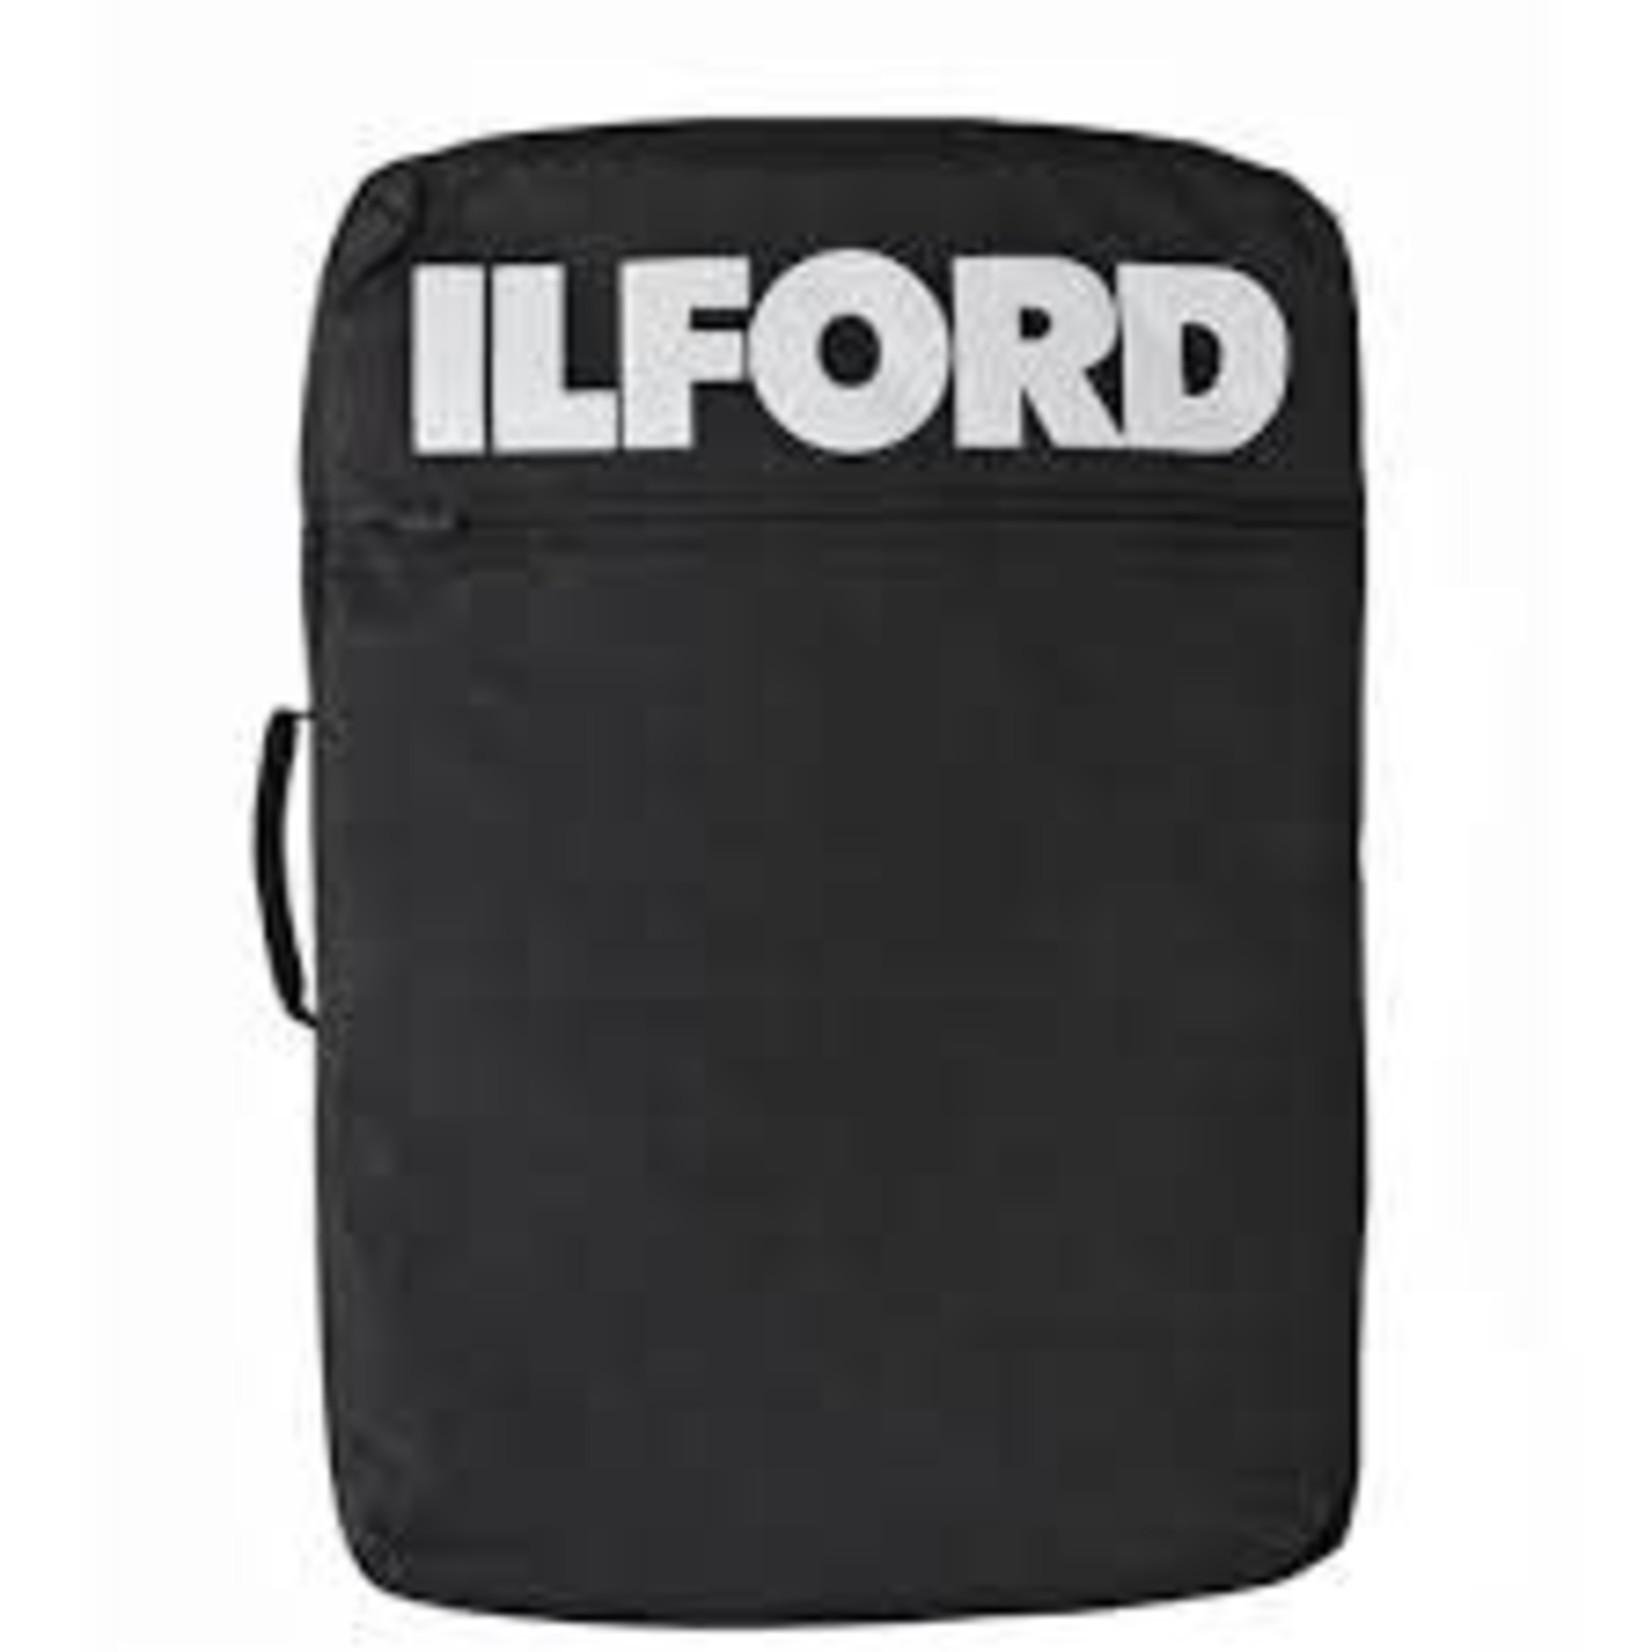 Ilford Portfolio Bag for A3+ Paper